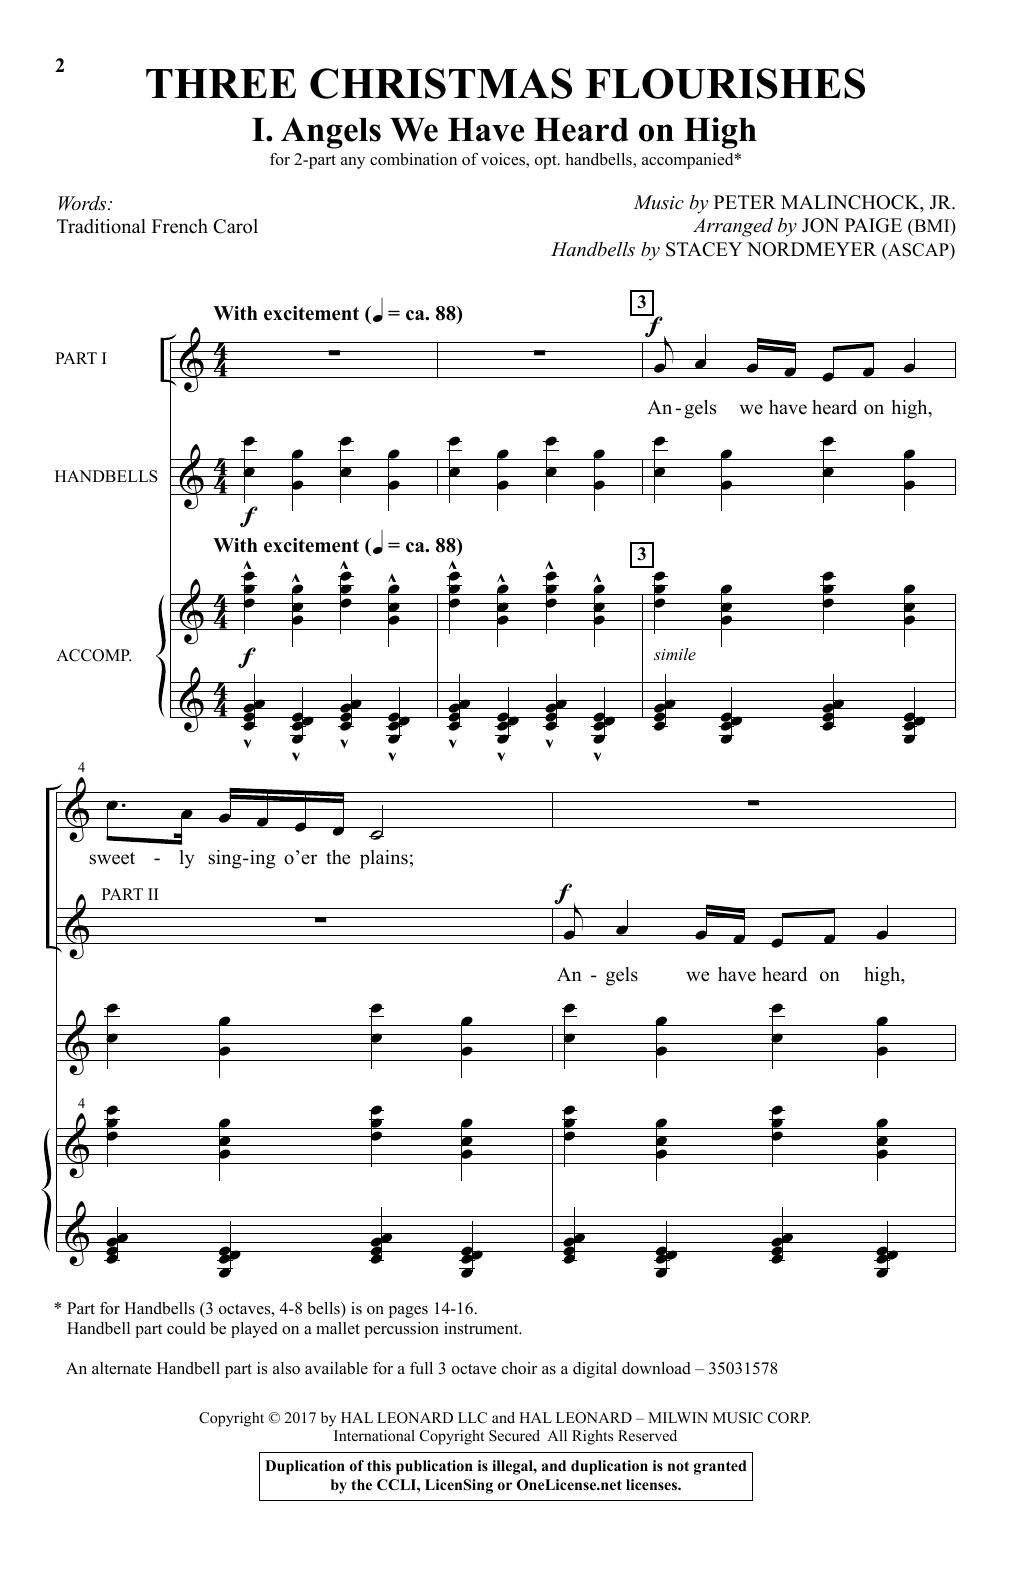 Angels We Have Heard On High (Choir)